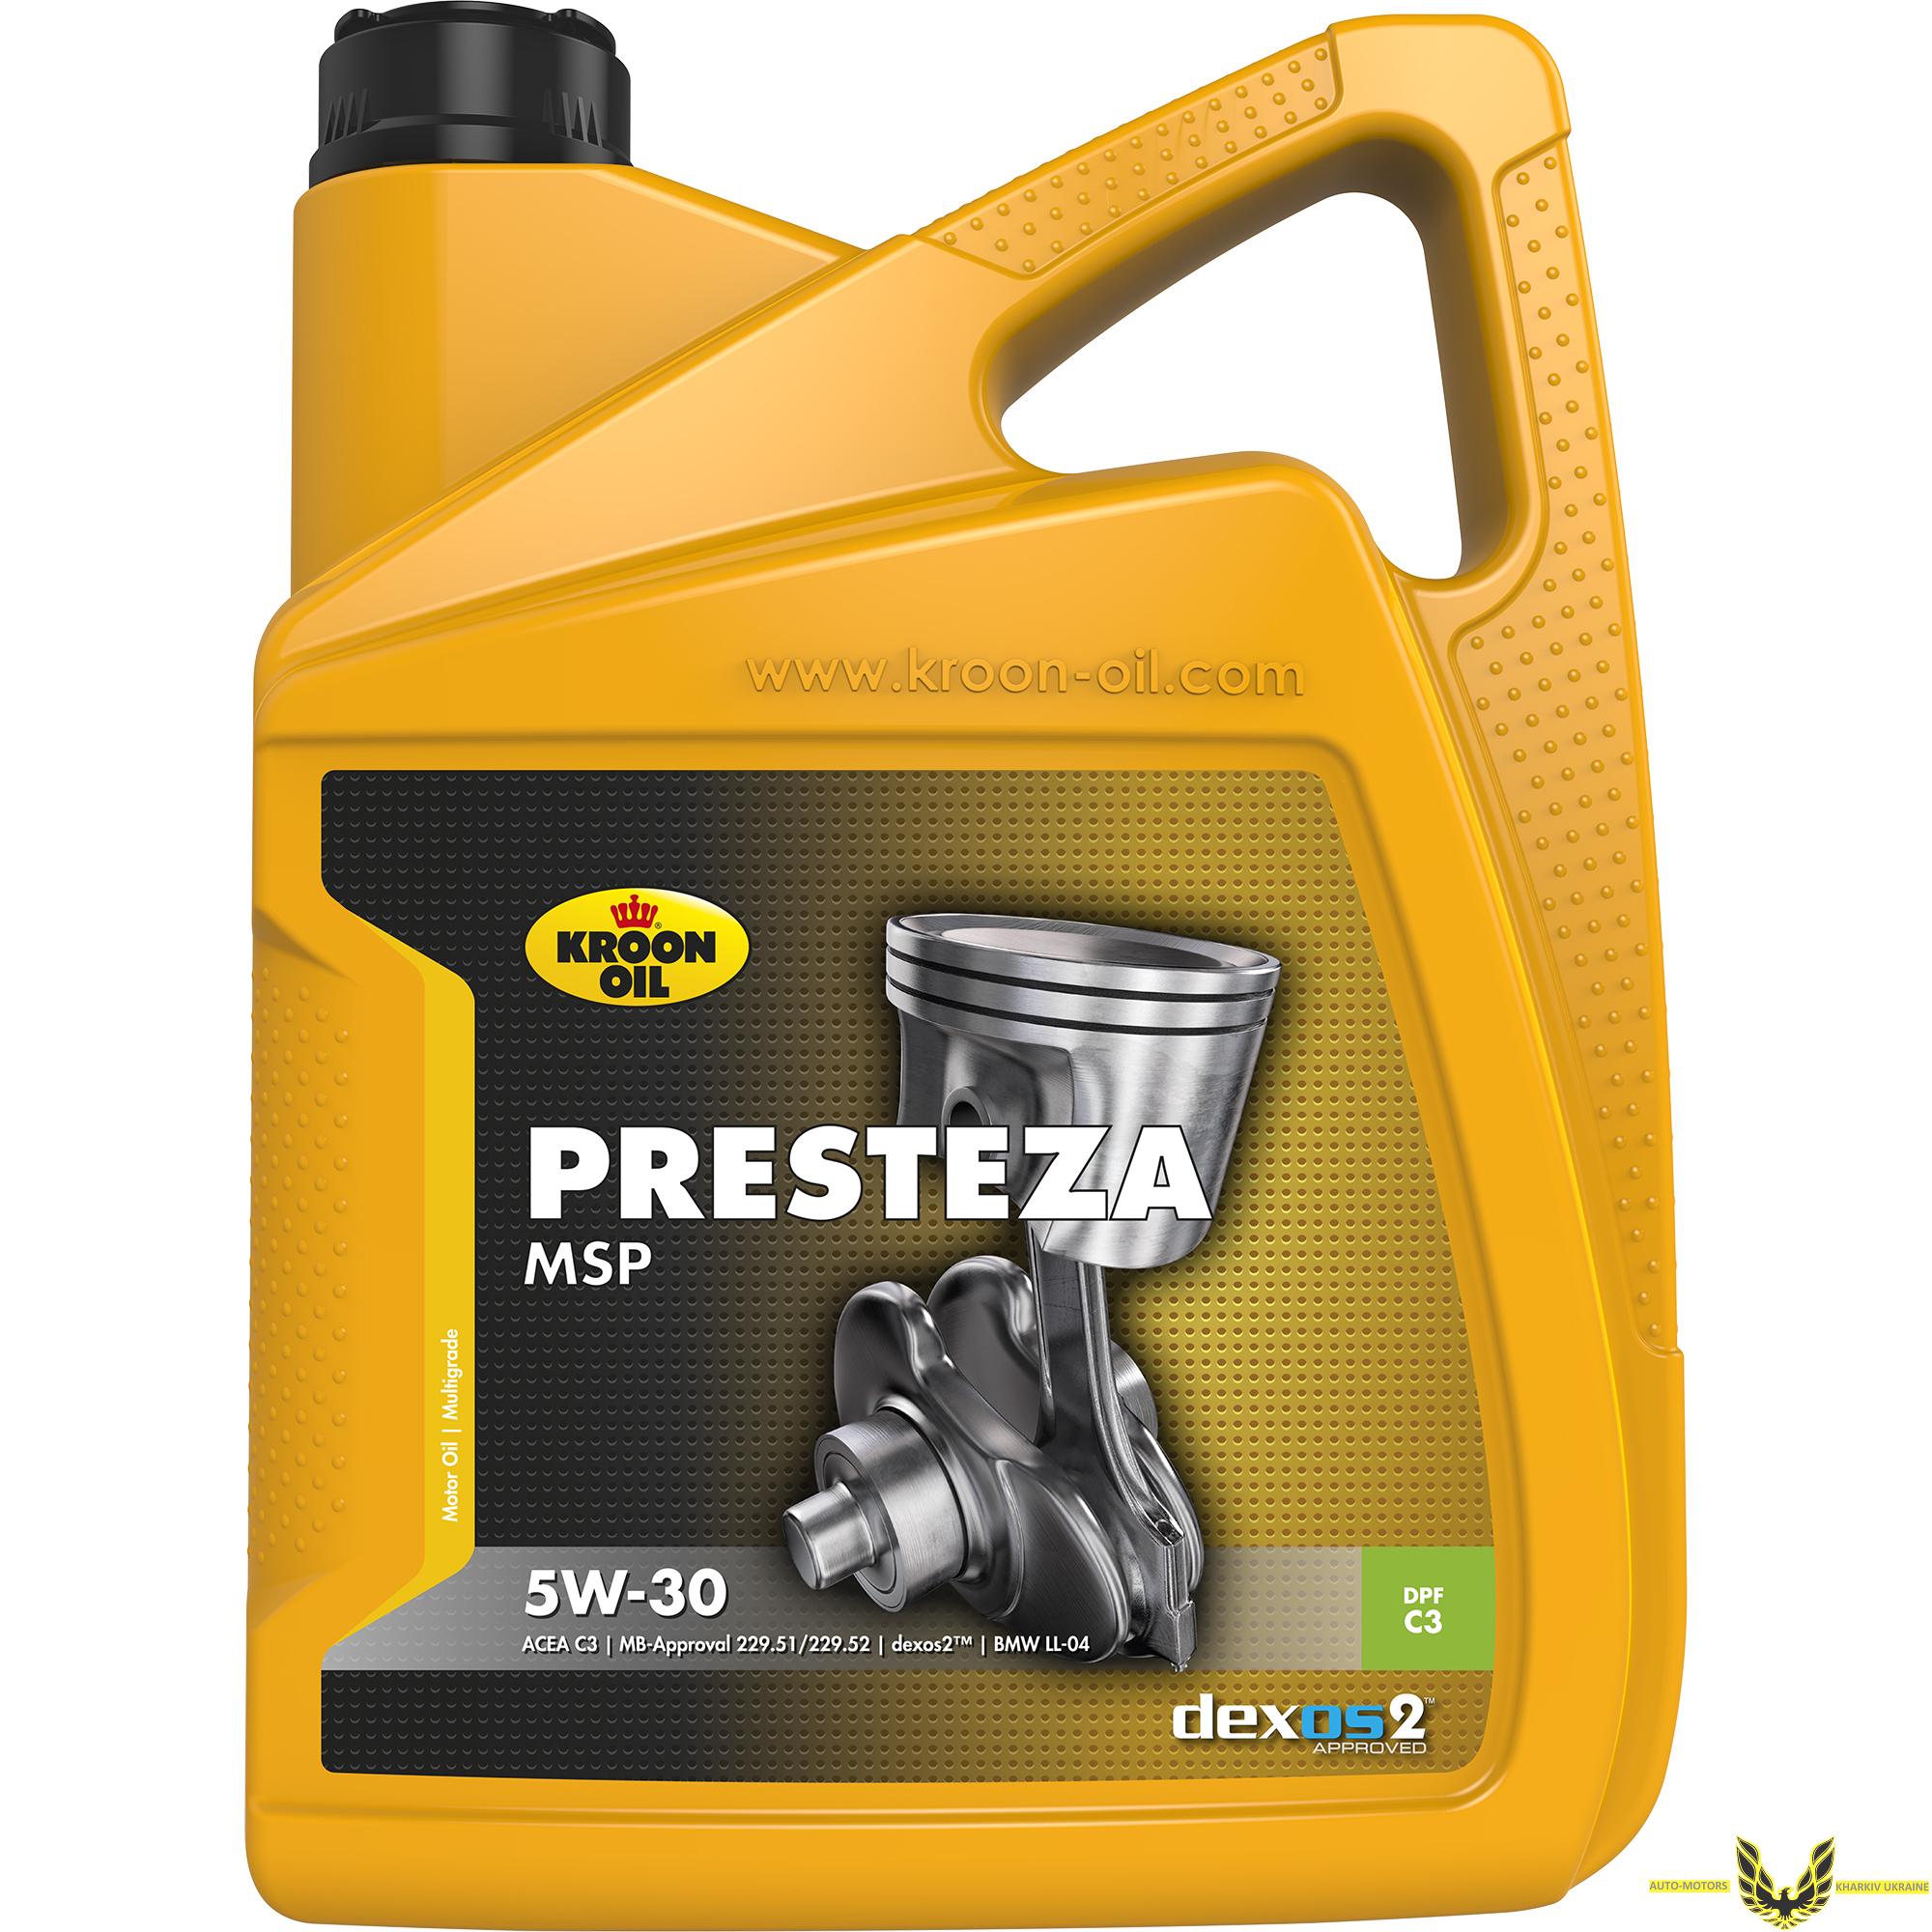 Presteza MSP 5W-30 5л